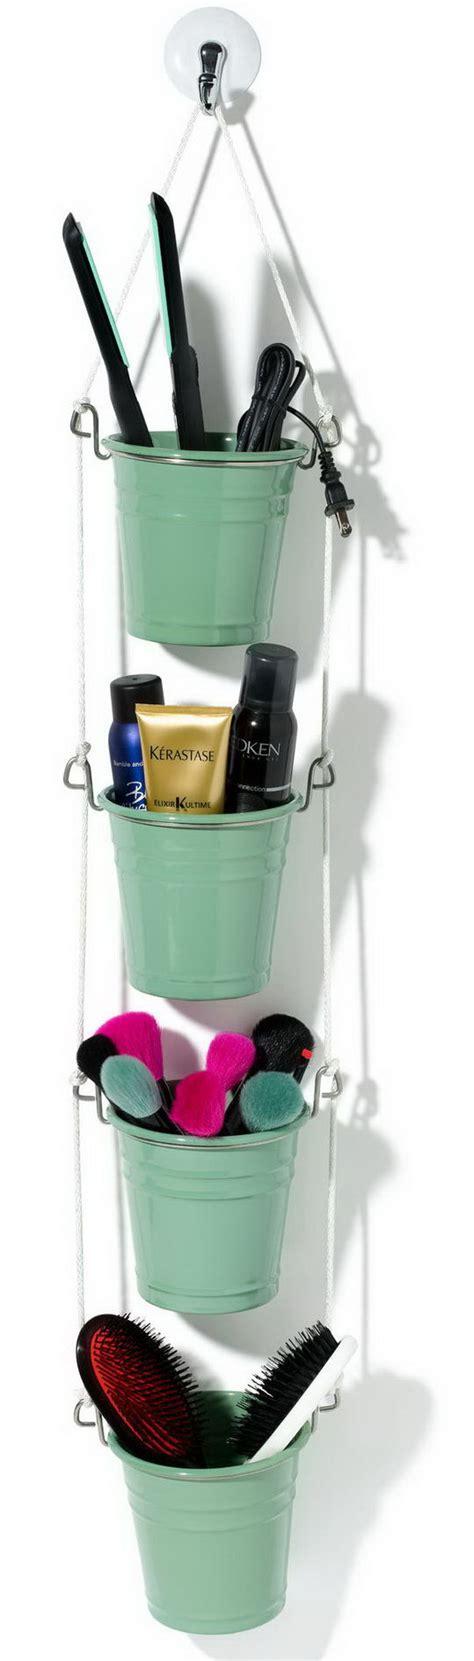 diy makeup storage organizer 25 diy makeup storage ideas and tutorials hative